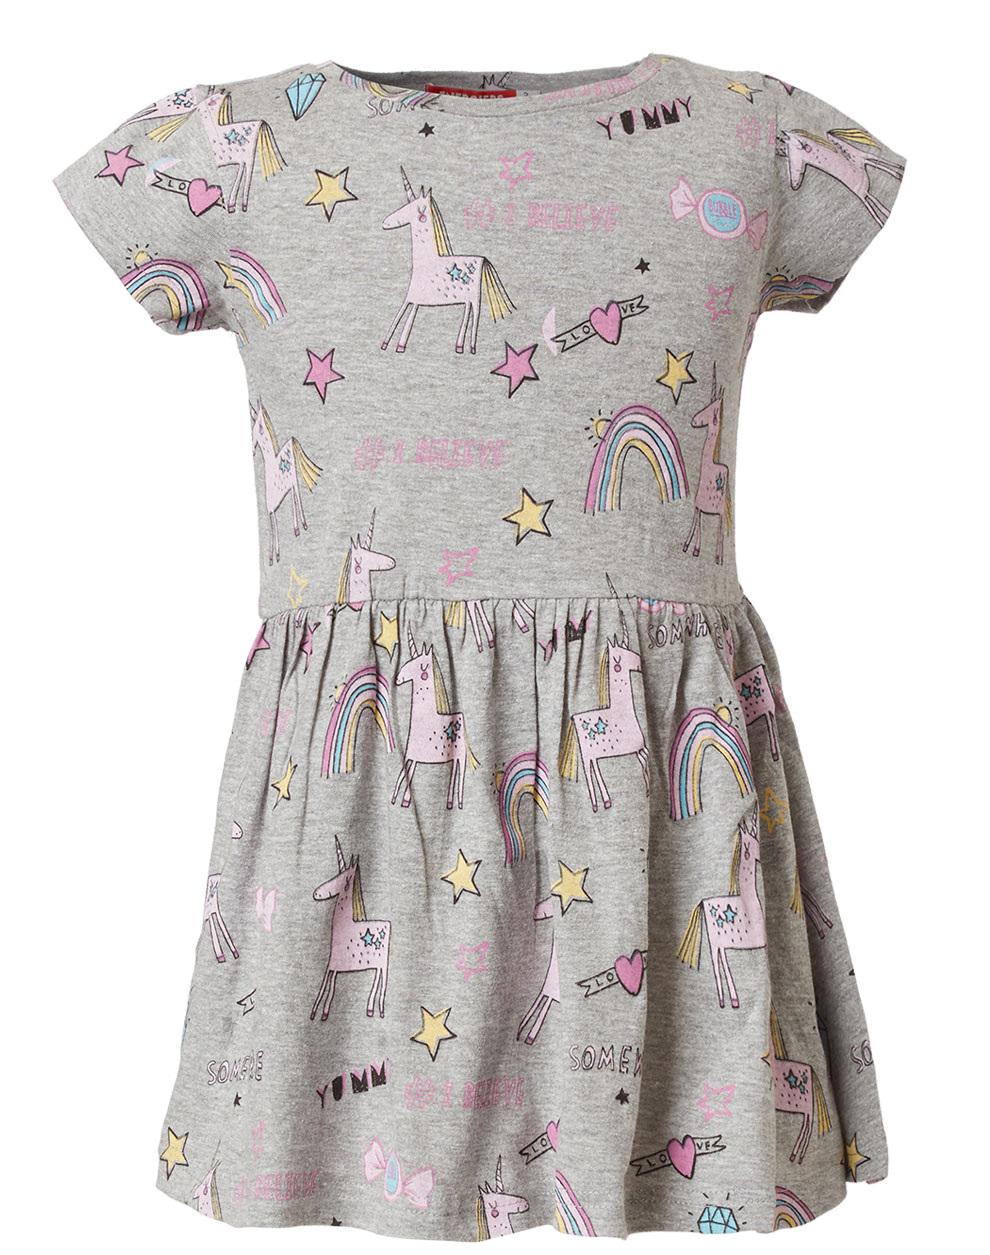 c5acdd4619a4 Φόρεμα μακώ τύπωμα μονόκερος